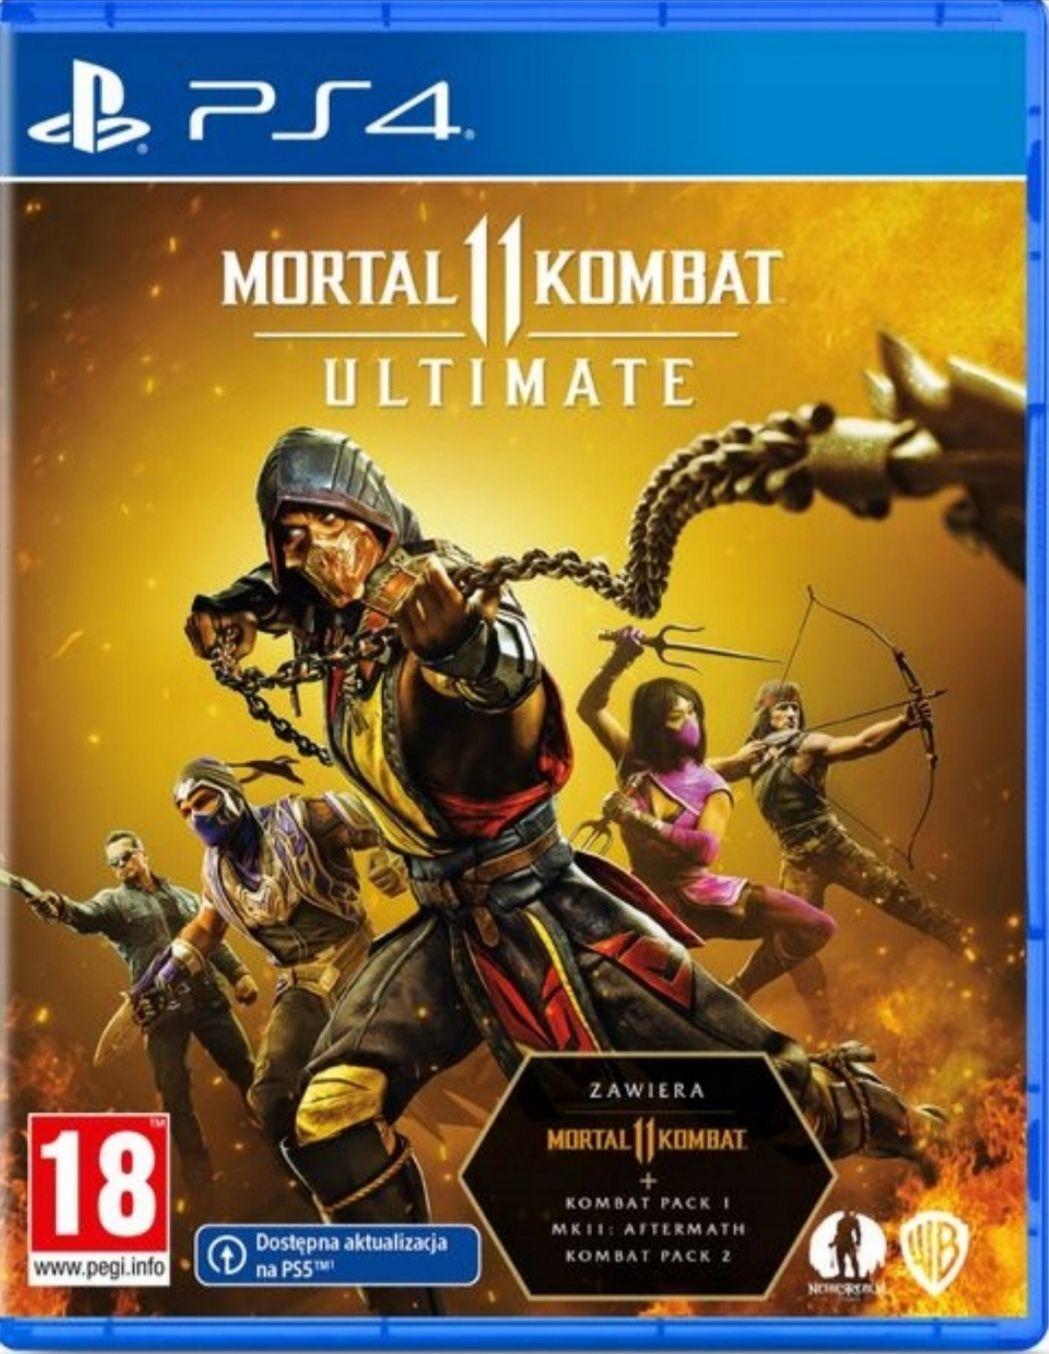 MORTAL KOMBAT 11 ULTIMATE PS4 PlayStation 4